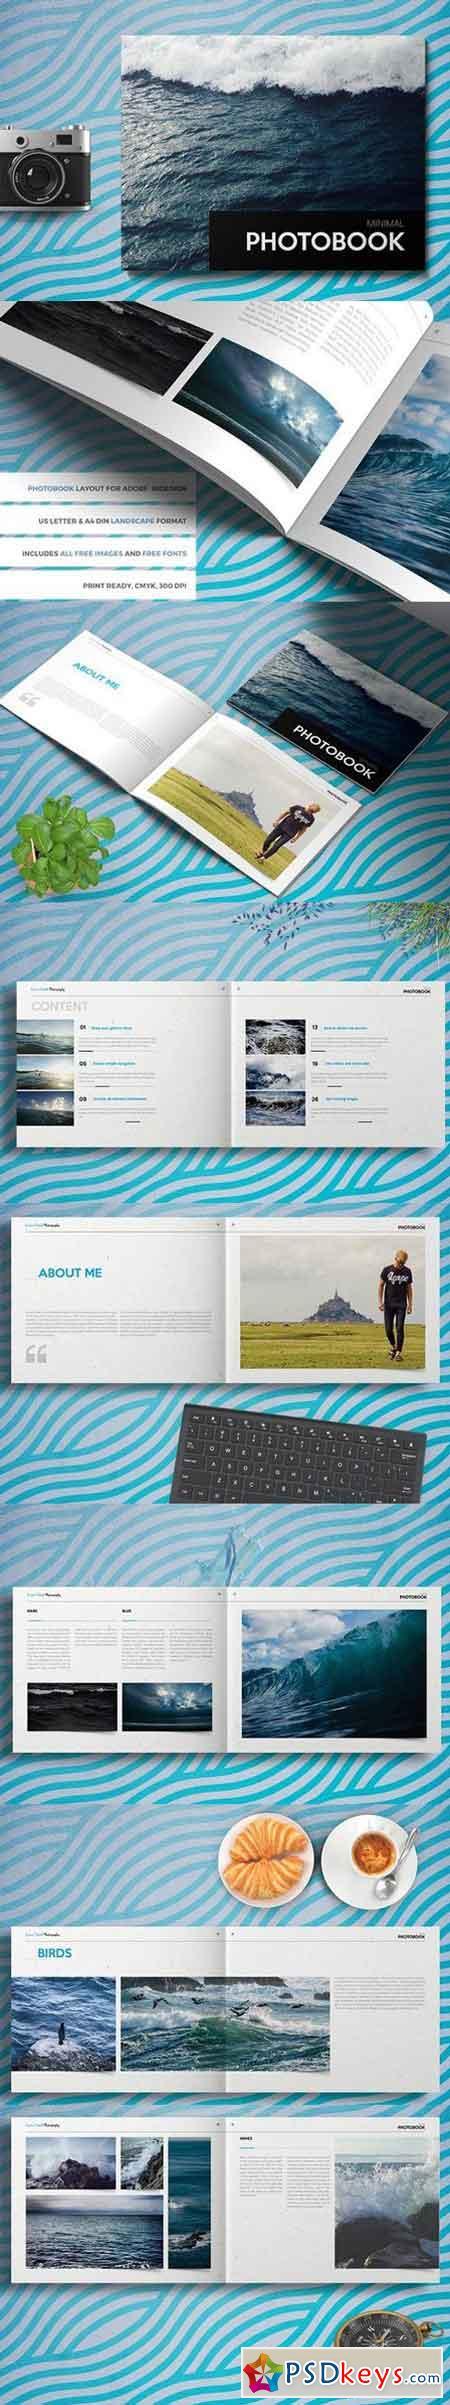 PHOTOBOOK landscape brochure 1437230